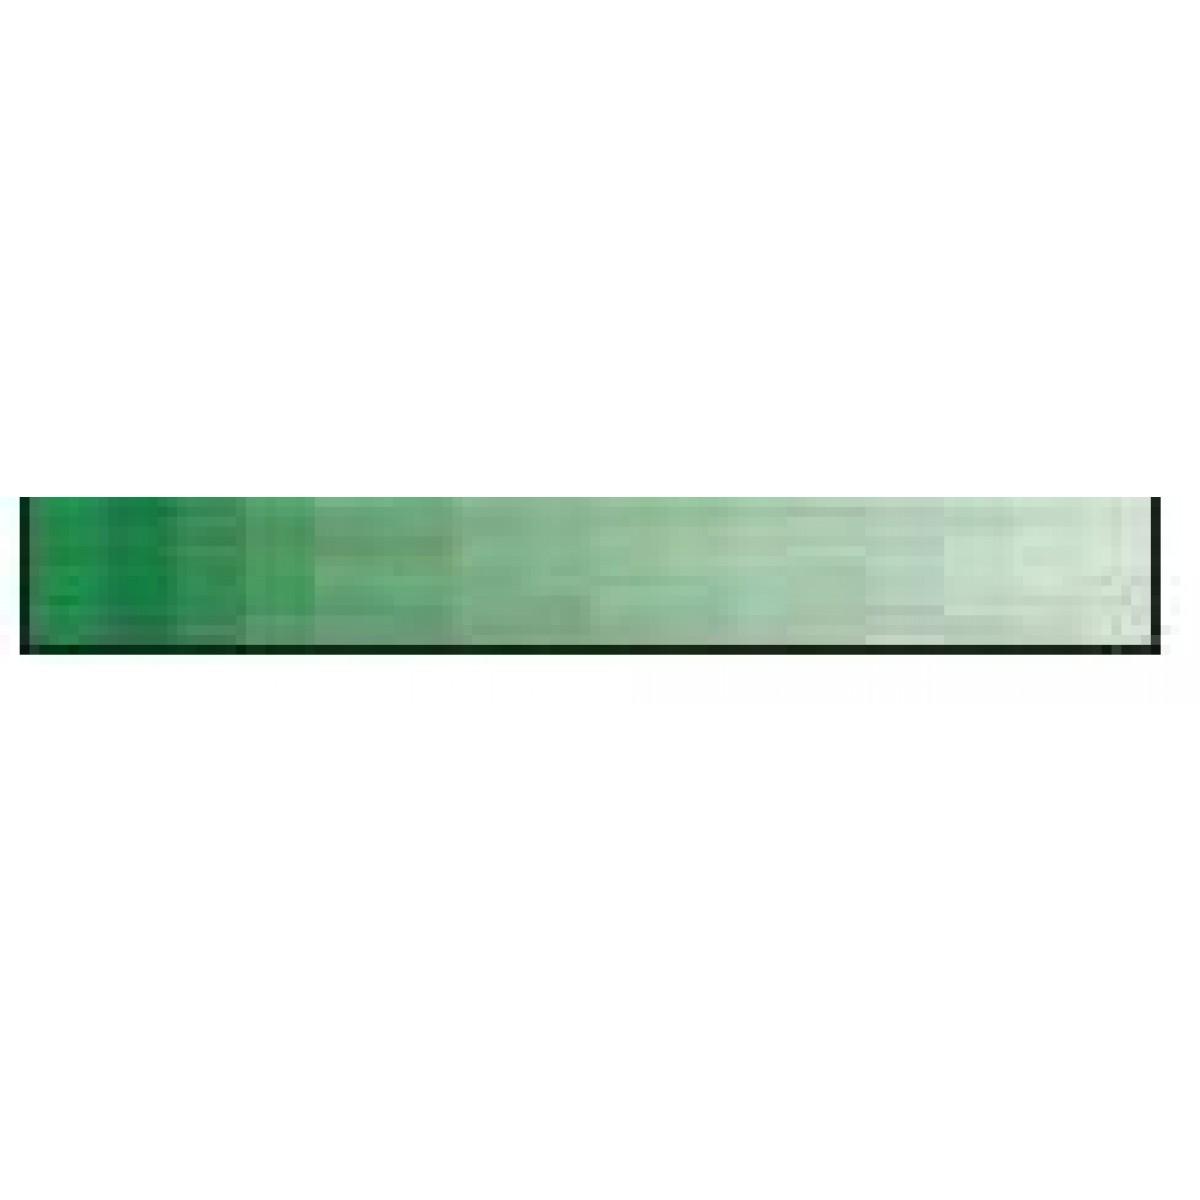 8508 Kunstnerkvalitet soft pastel Permanent green